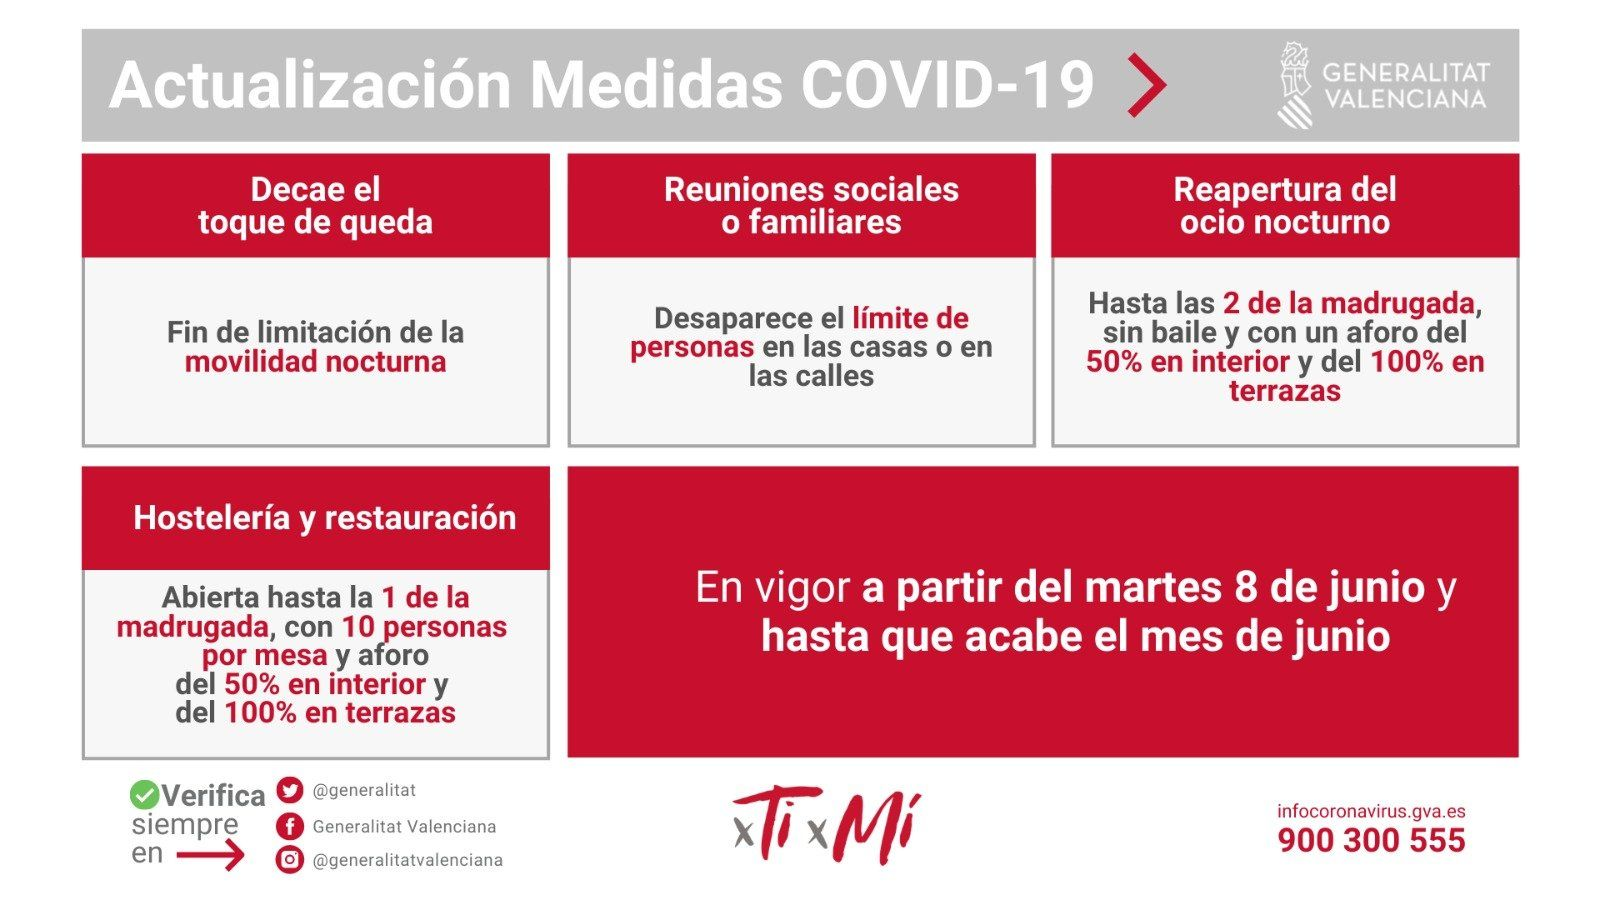 GVA medidas covid-19 3-6-2021